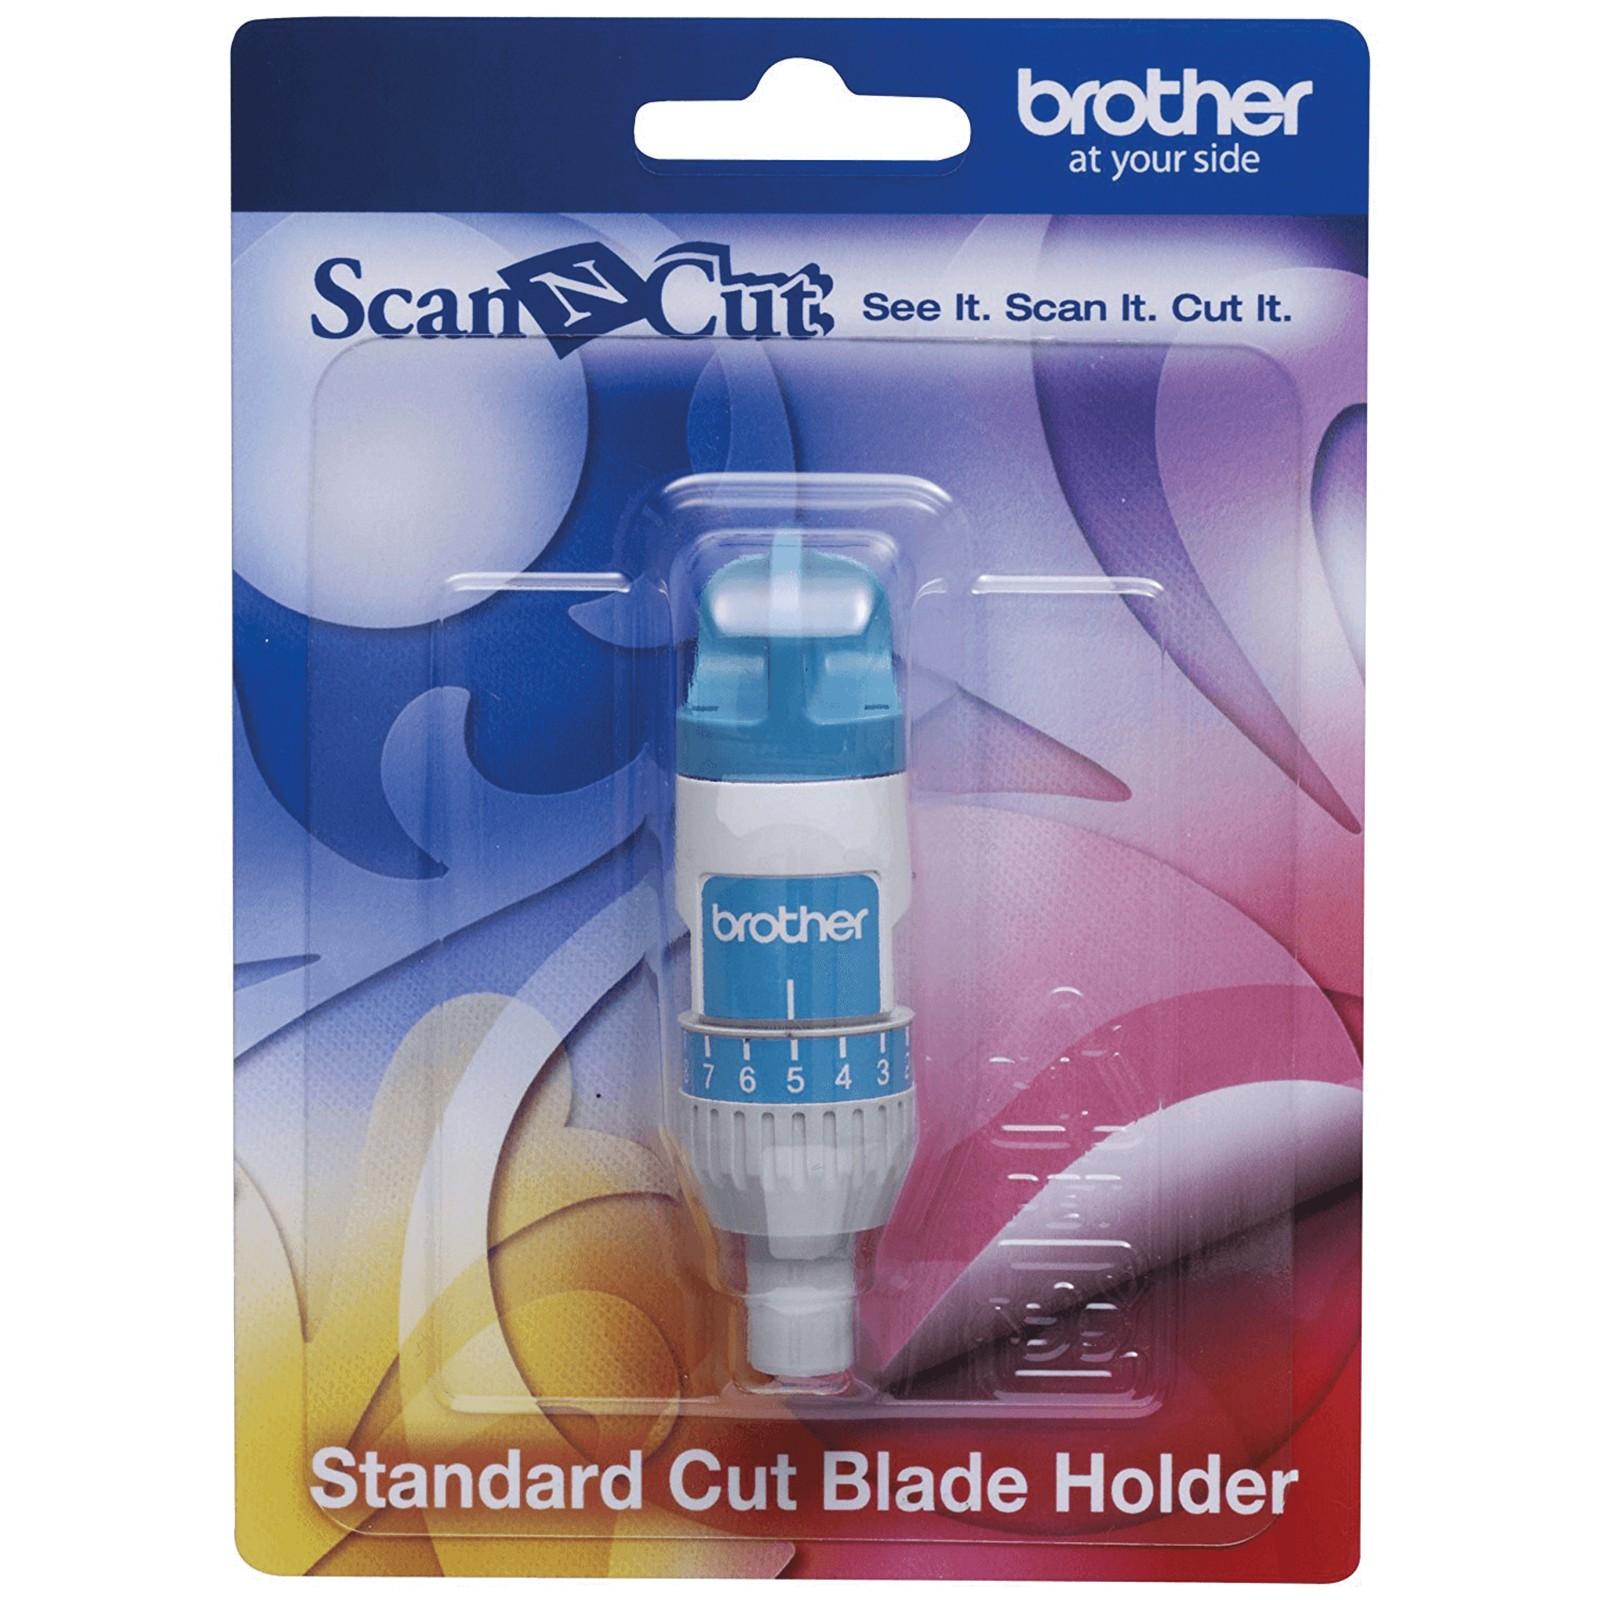 Brother SCAN'N'CUT CAHLP1 STANDARD CUTTER BLADE HOLDER